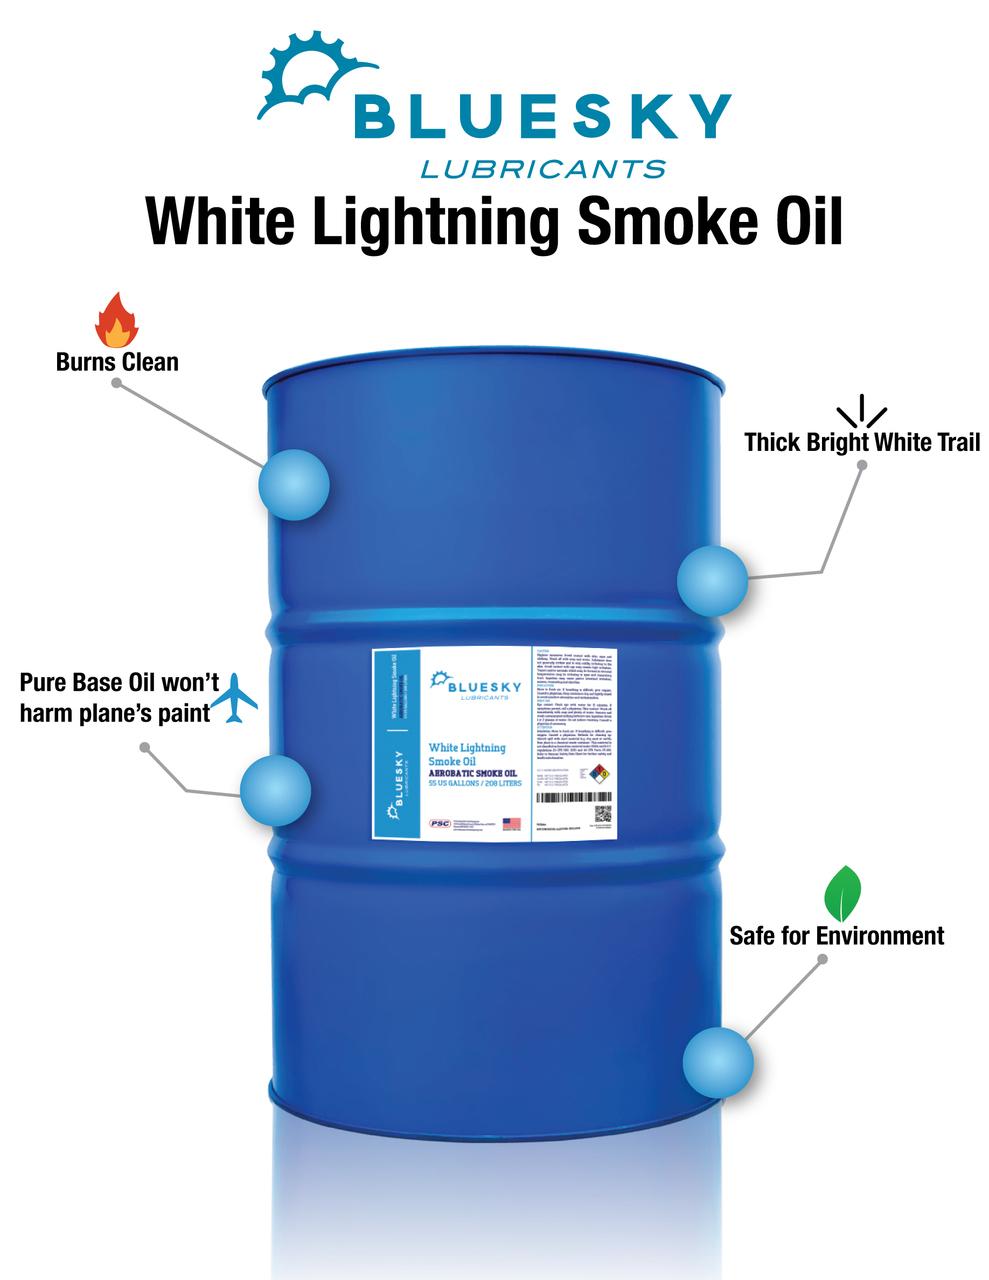 Bluesky Lubricants White Lightning Smoke Oil